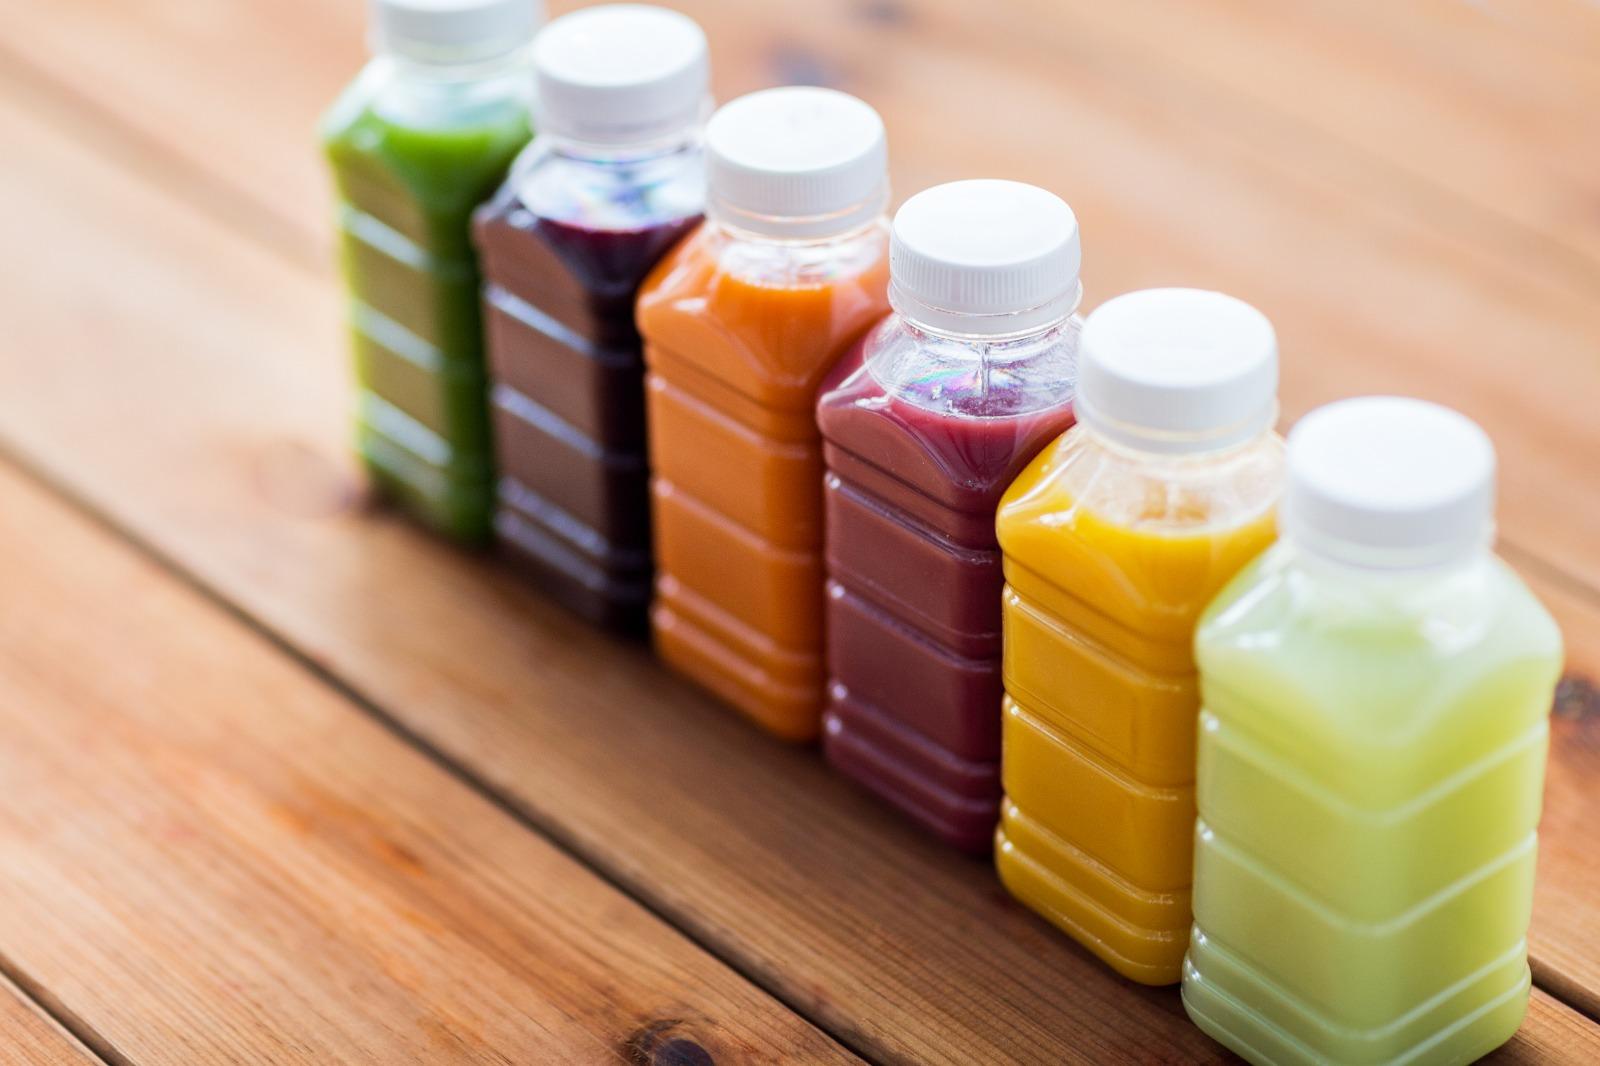 Compostable juice bottles